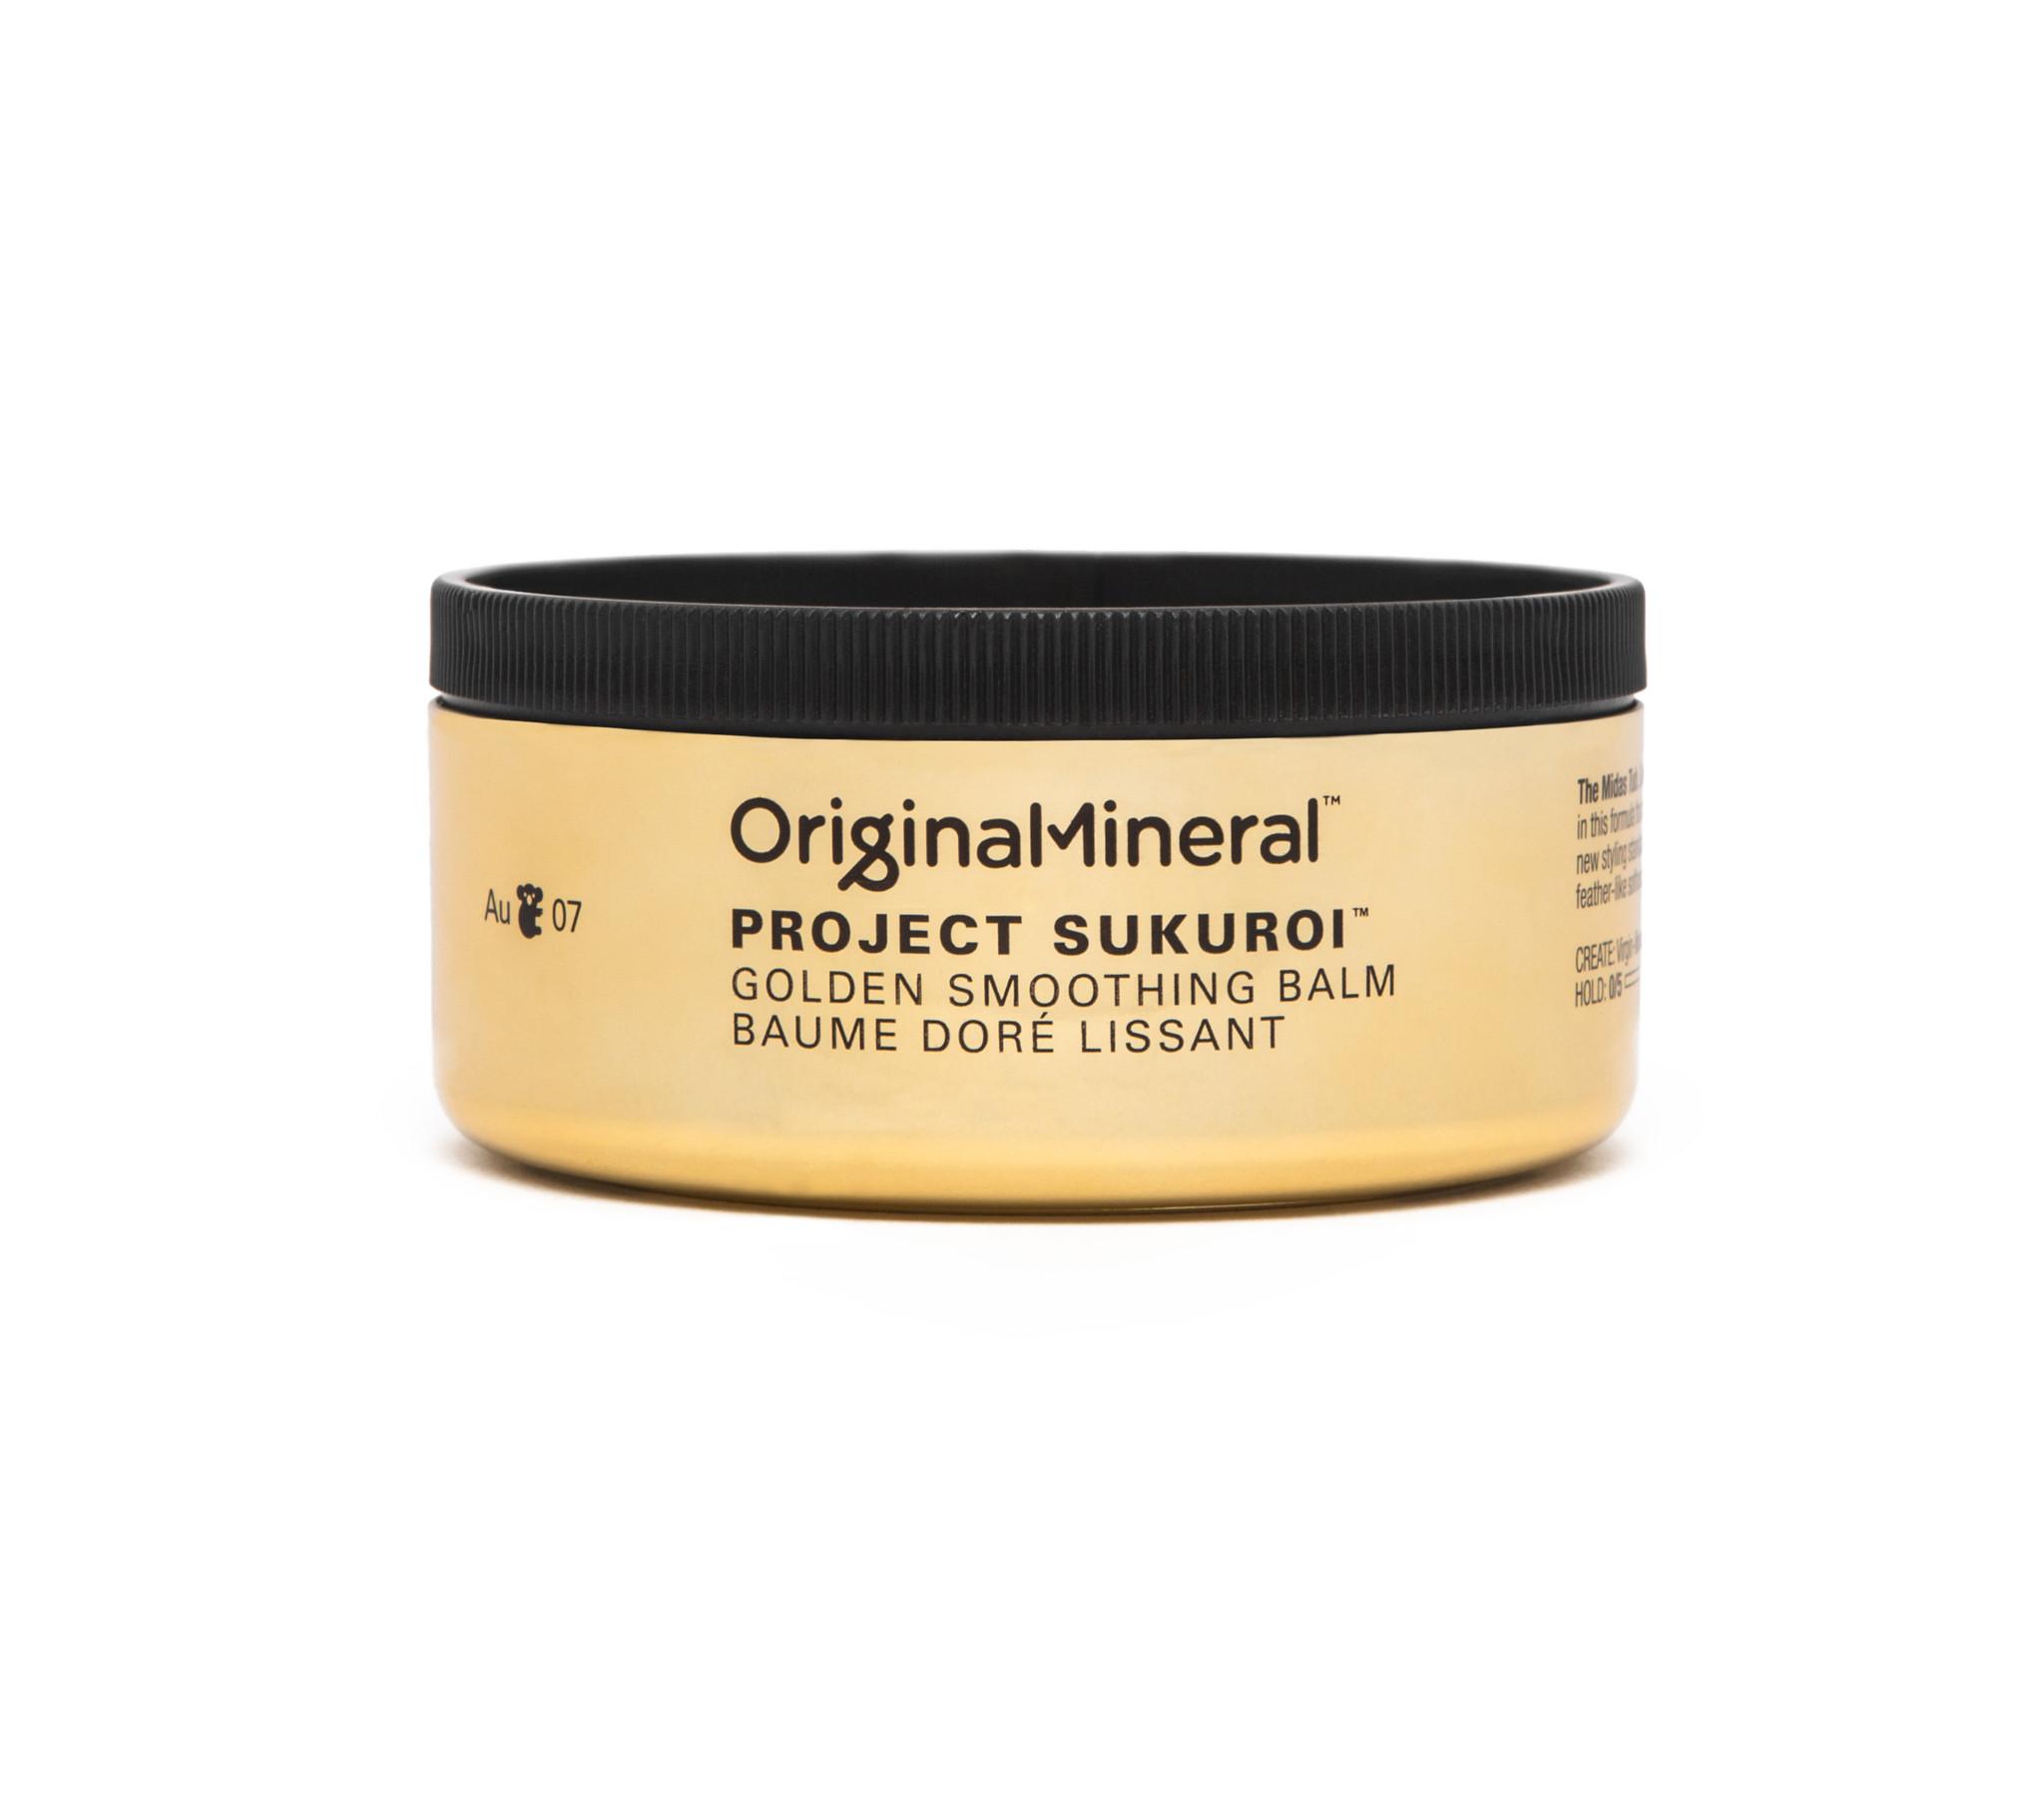 O&M - Original Mineral O&M Project Sukuroi Gold Smoothing Balm - Baume doré lissant - 100g